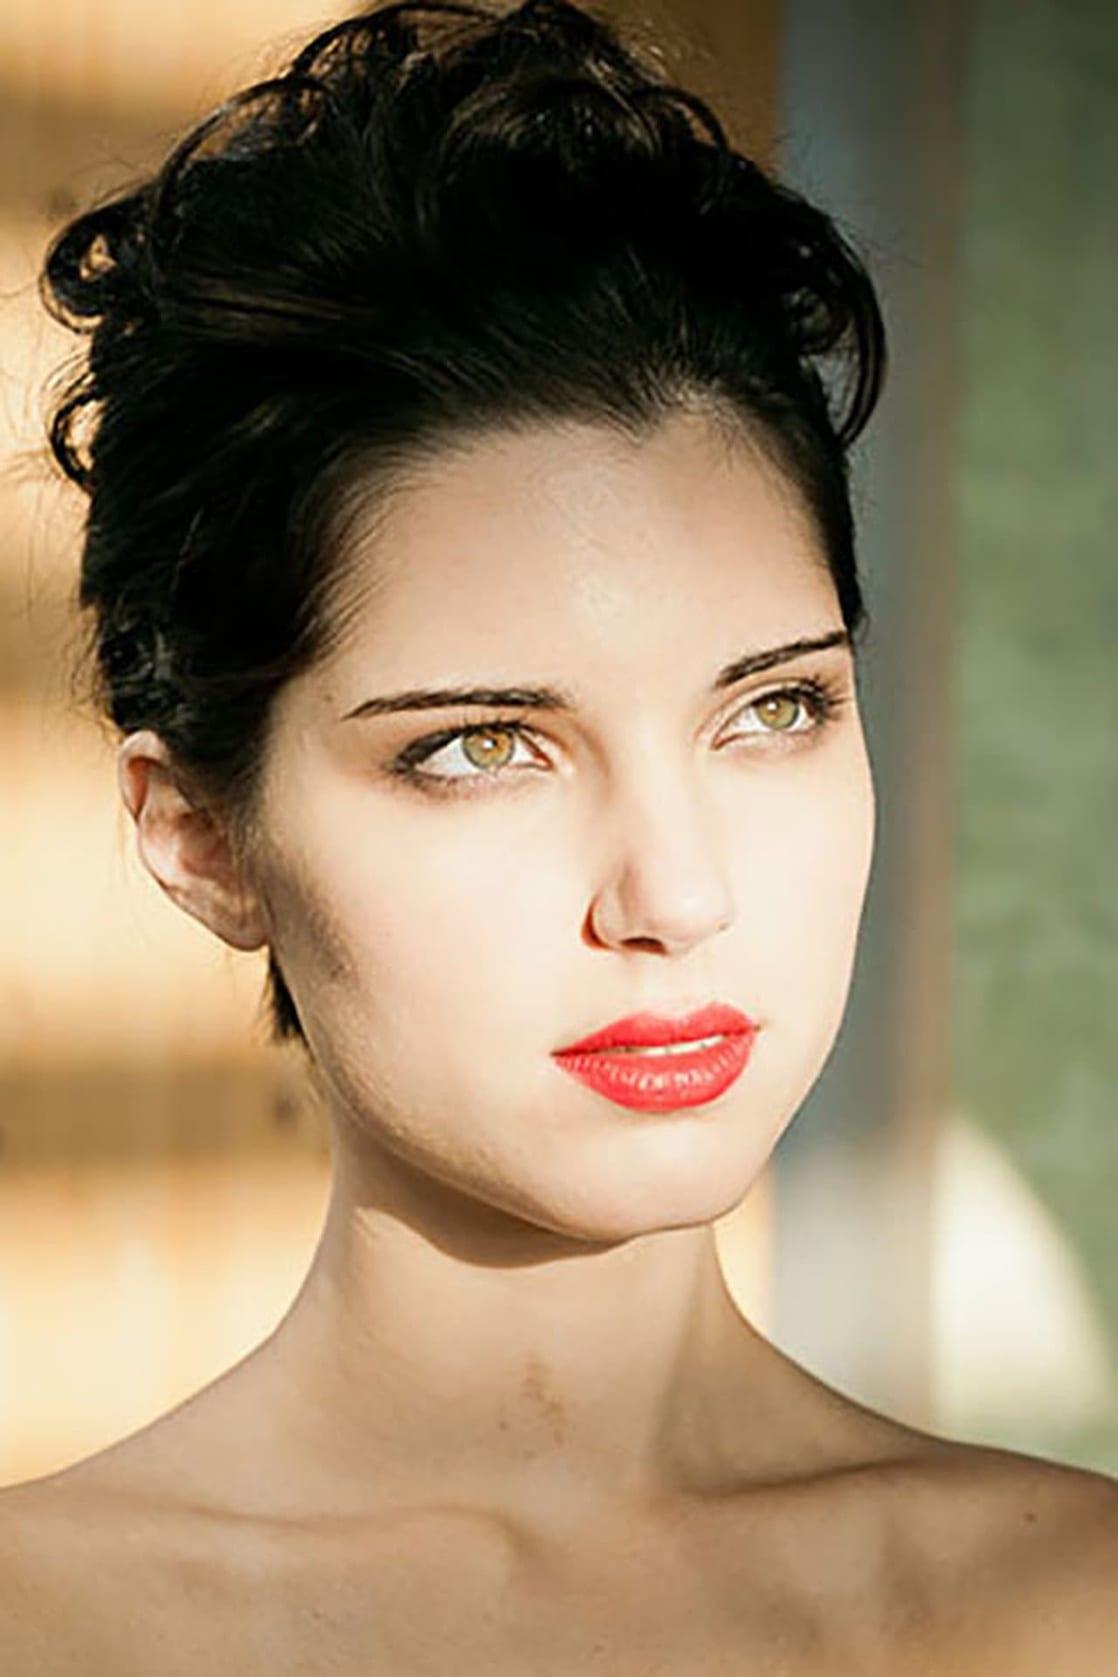 Michalina Olszanska